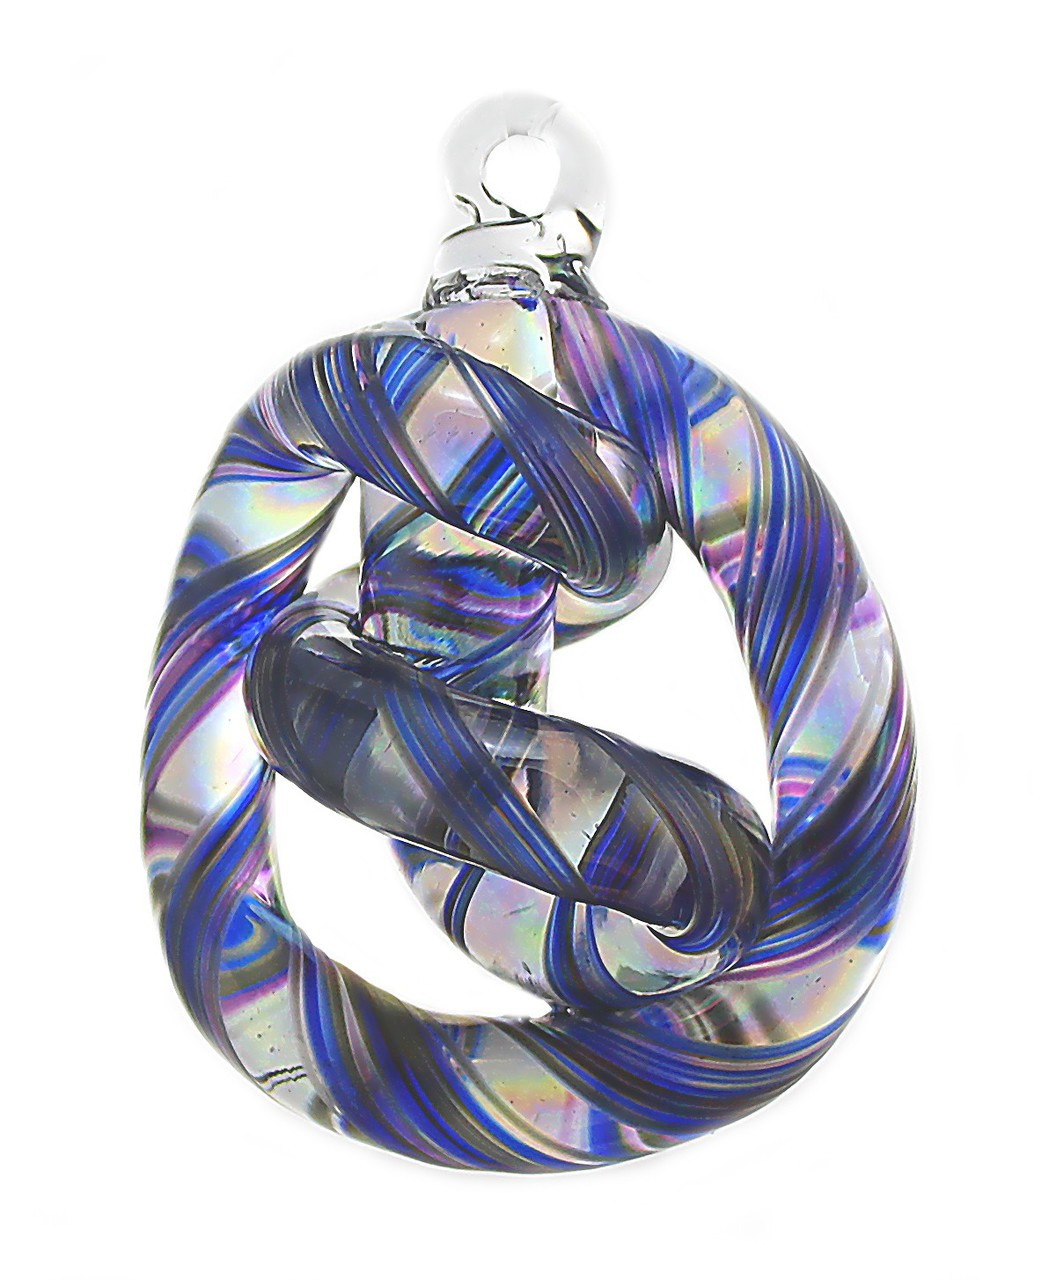 Unity Knot Blue, Black & Violet - Iron Art Glass Designs